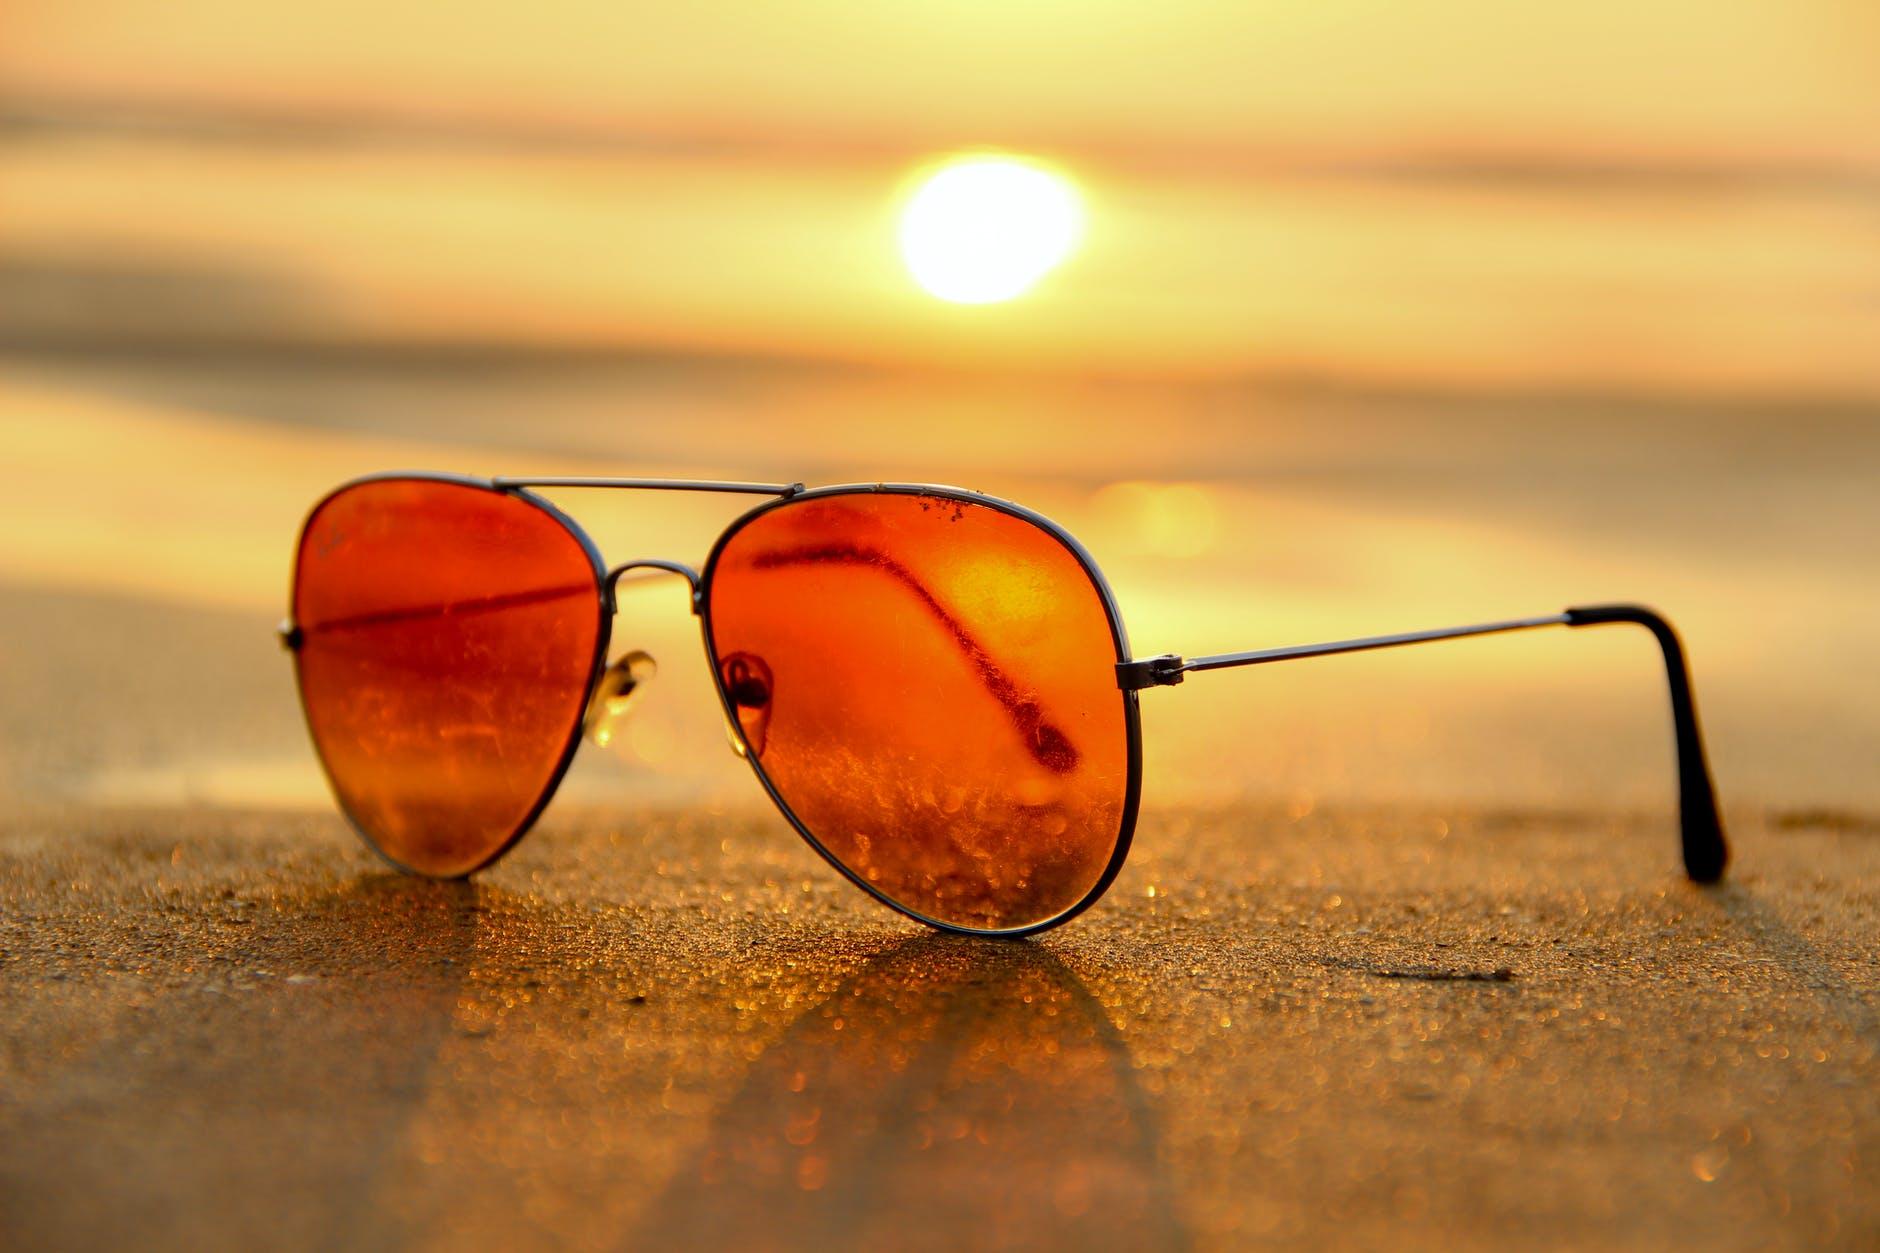 sunglasses sunset summer sand